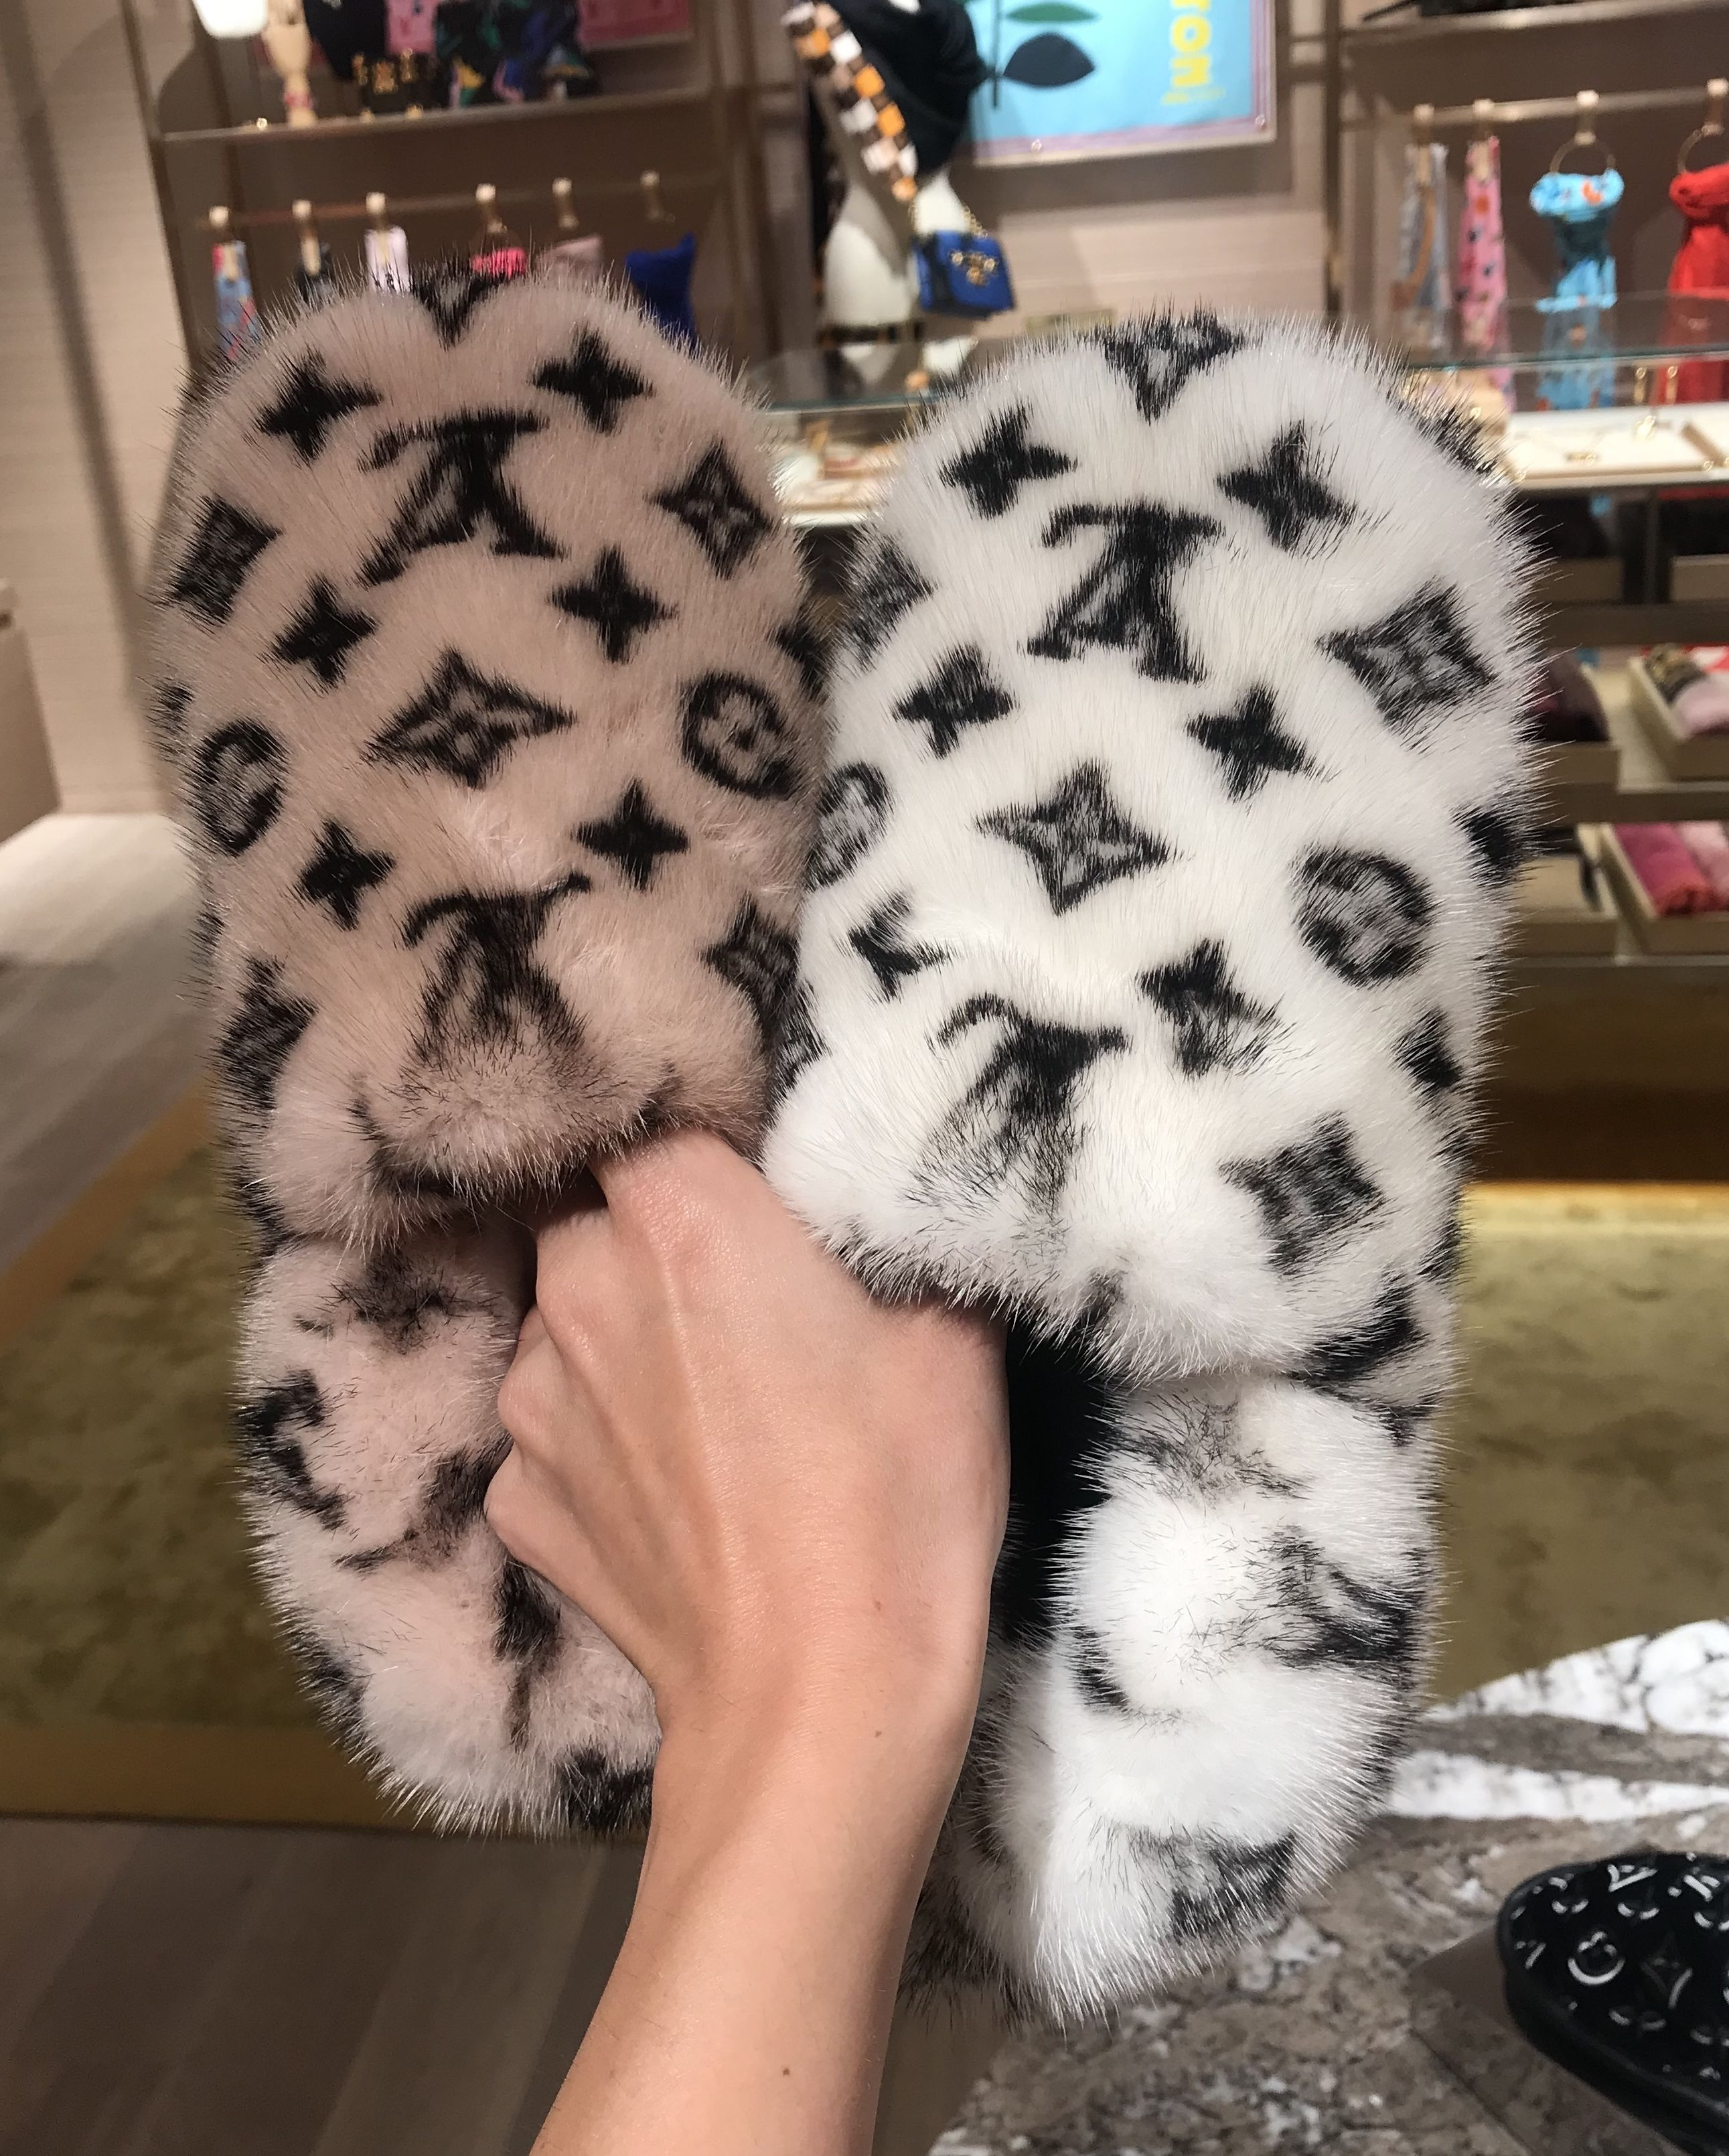 louis vuitton pink fur slippers